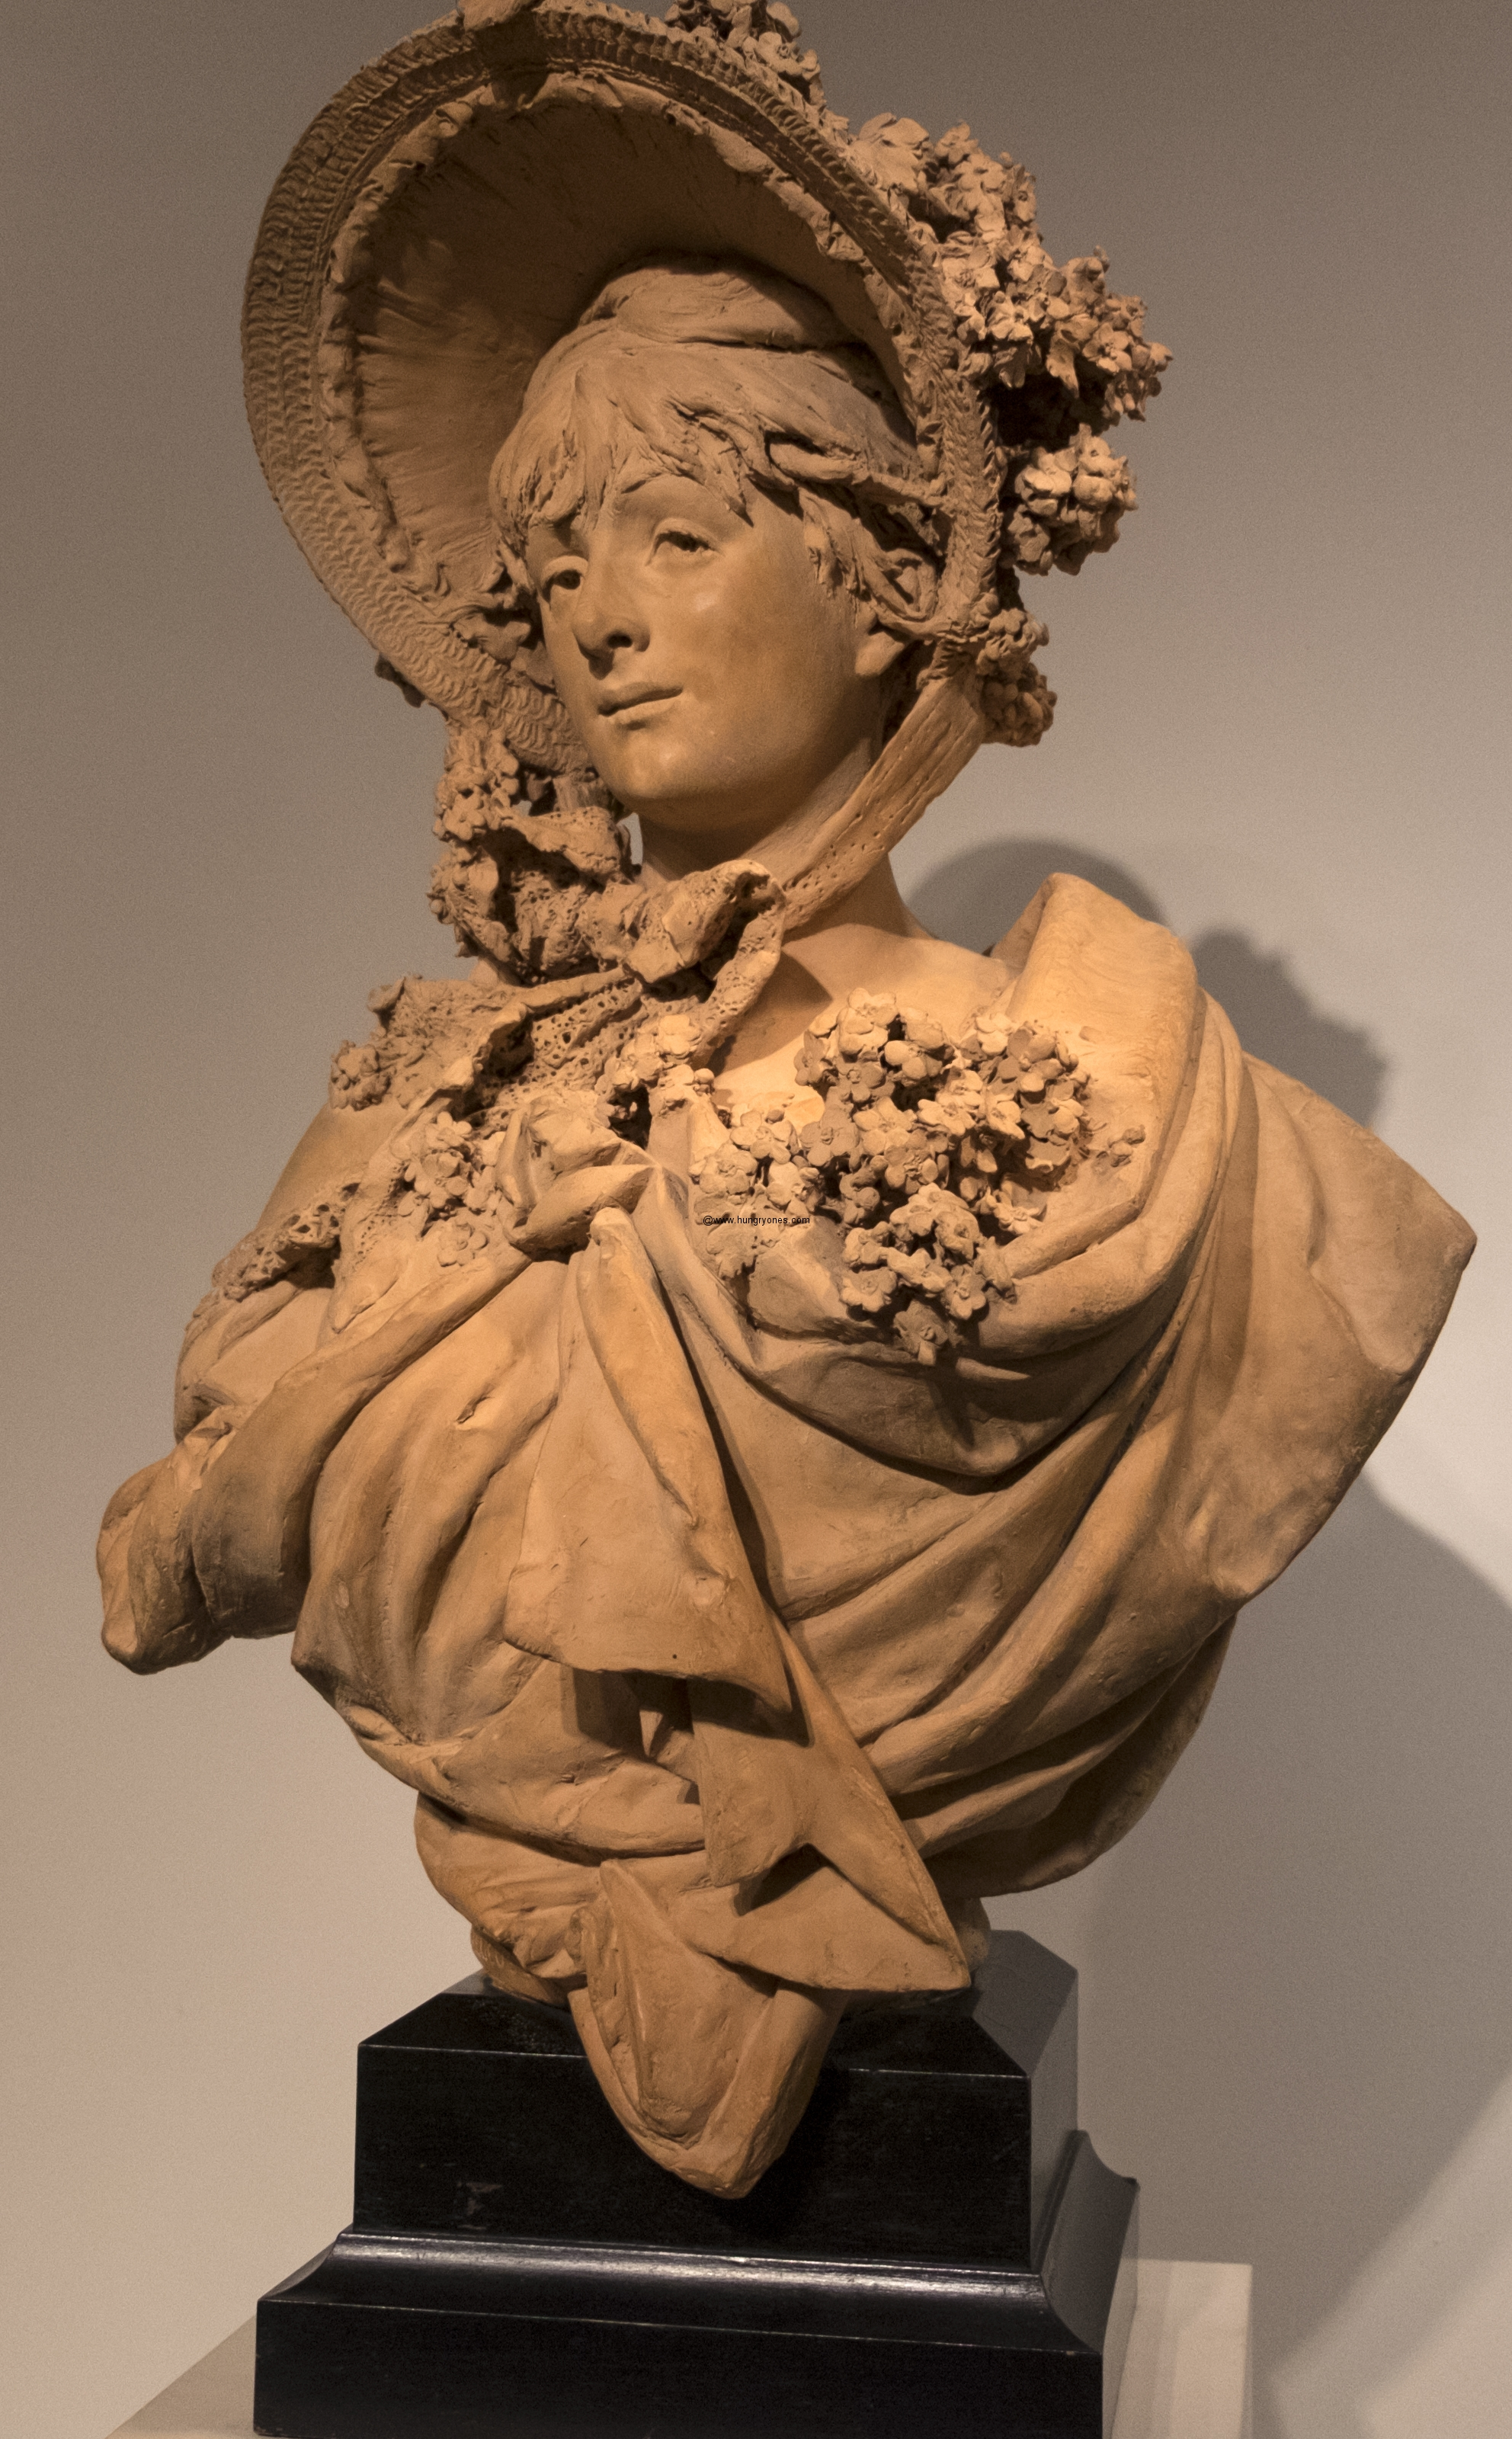 Girl In A Straw Bonnet Albert-Ernest Carrier-Belleuse 1824-1887 French (Paris) 1865-70